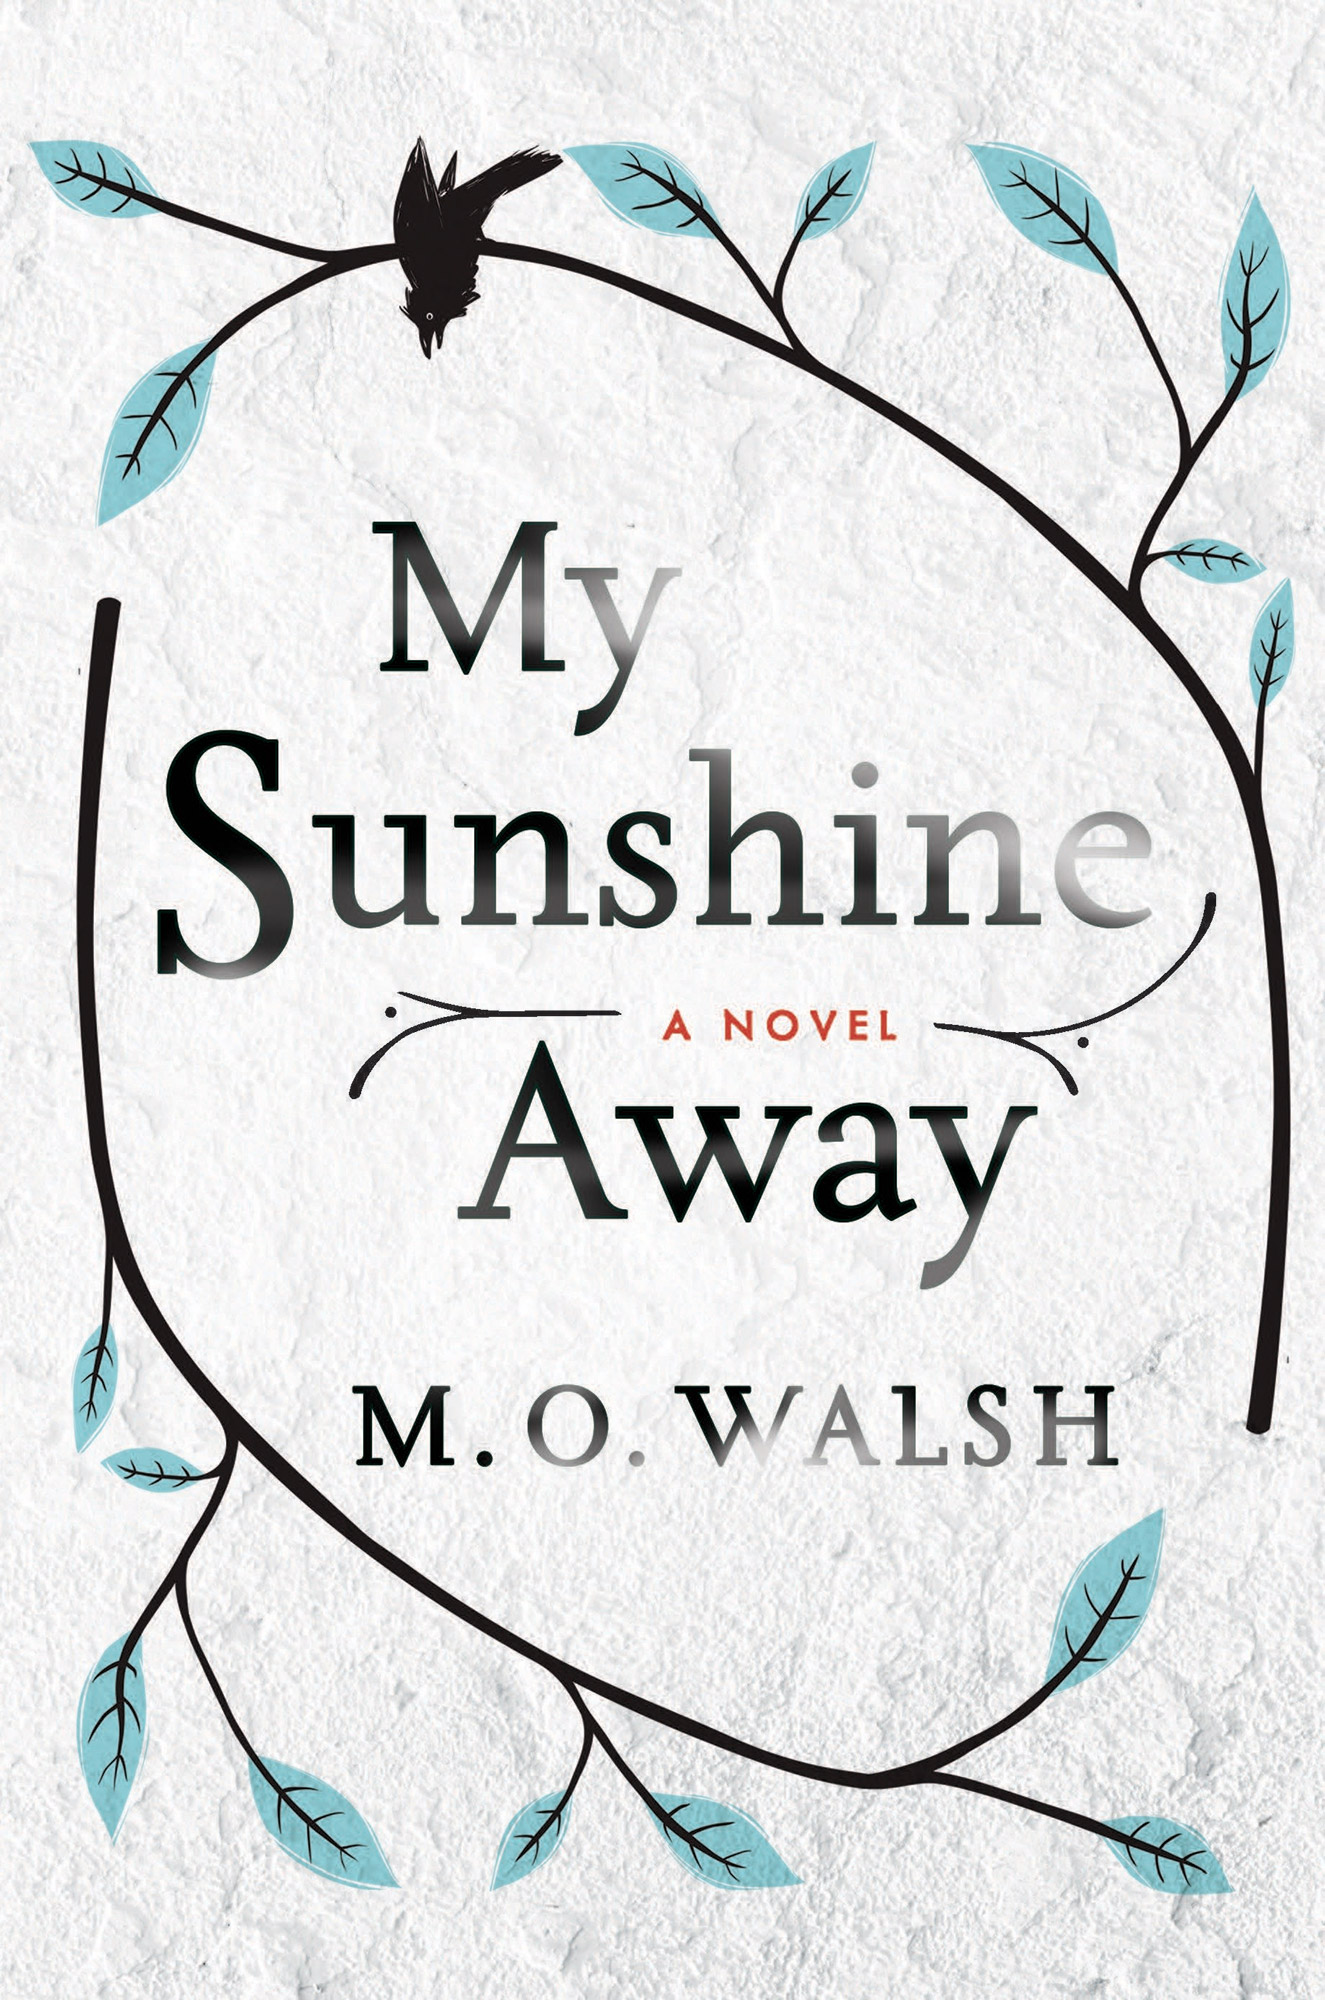 My Sunshine Away, by M.O. Walsh